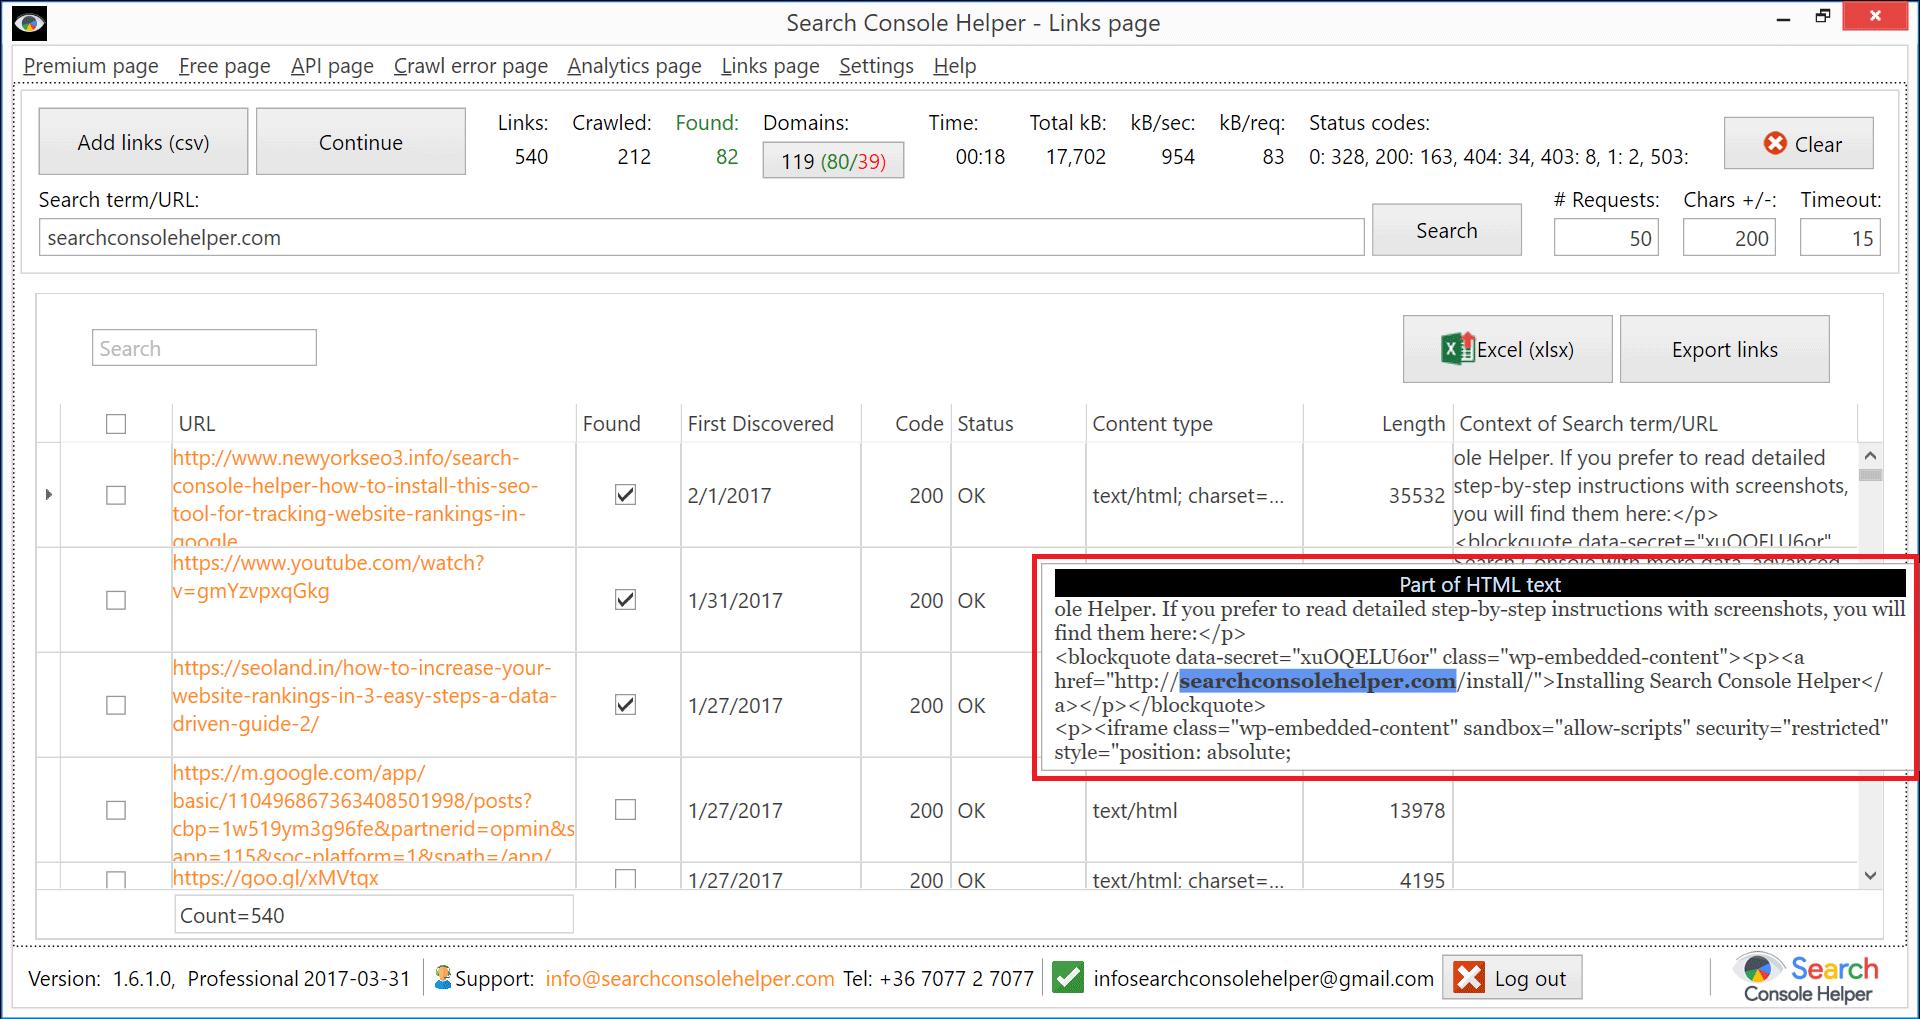 Backlink Analysis: Link Context